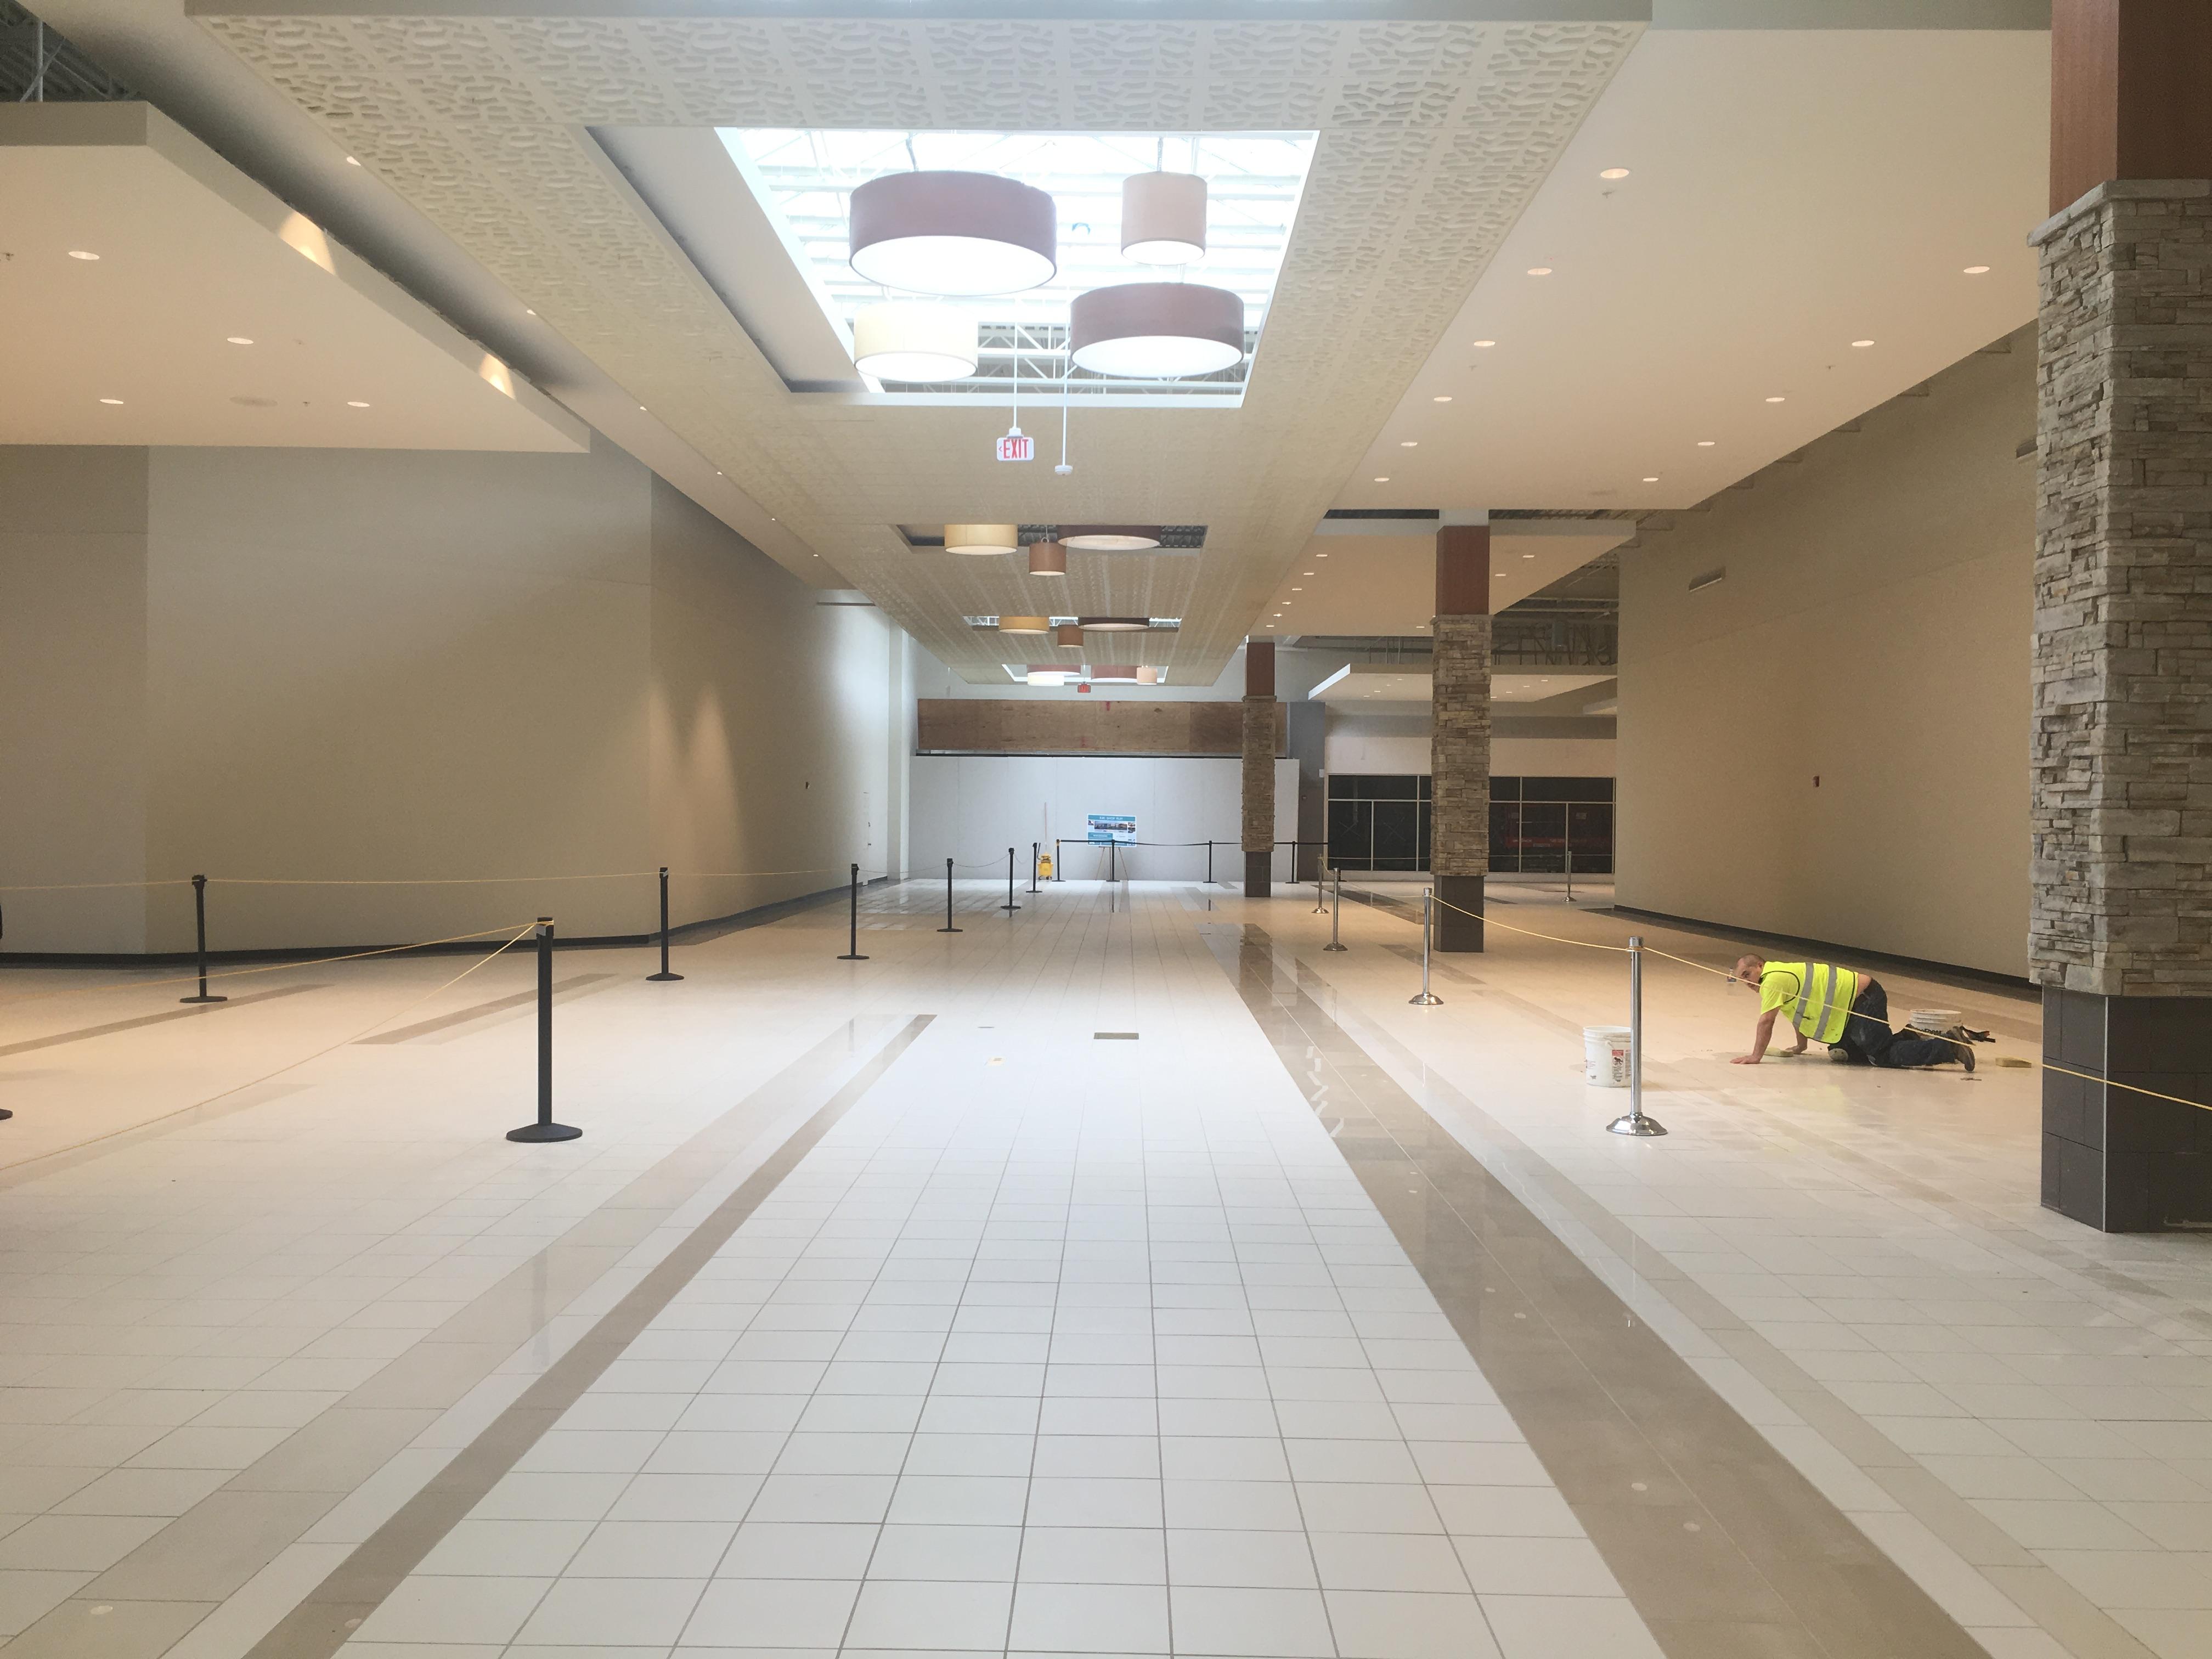 manassas mall expansion may 2016